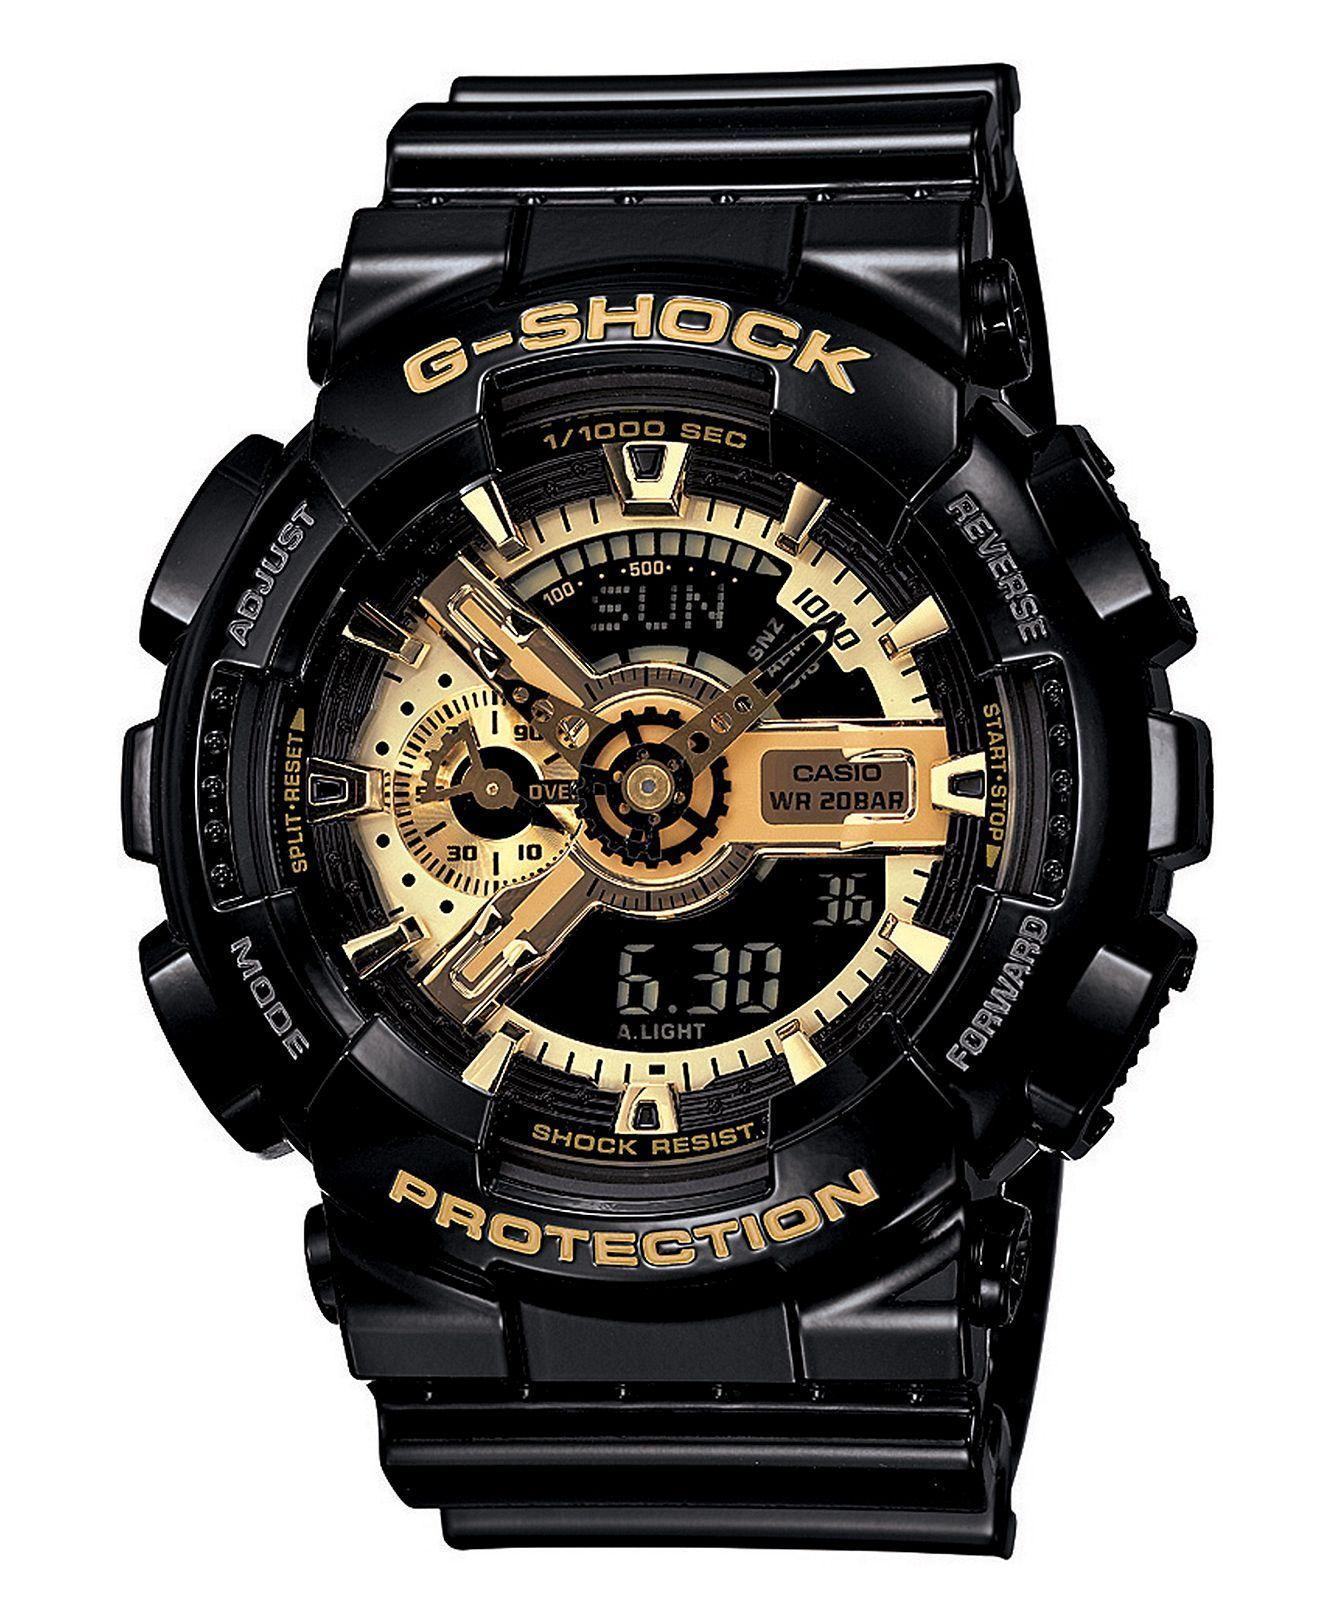 Unisex MRW200H2BV NeoDisplay Black Watch with Resin Band